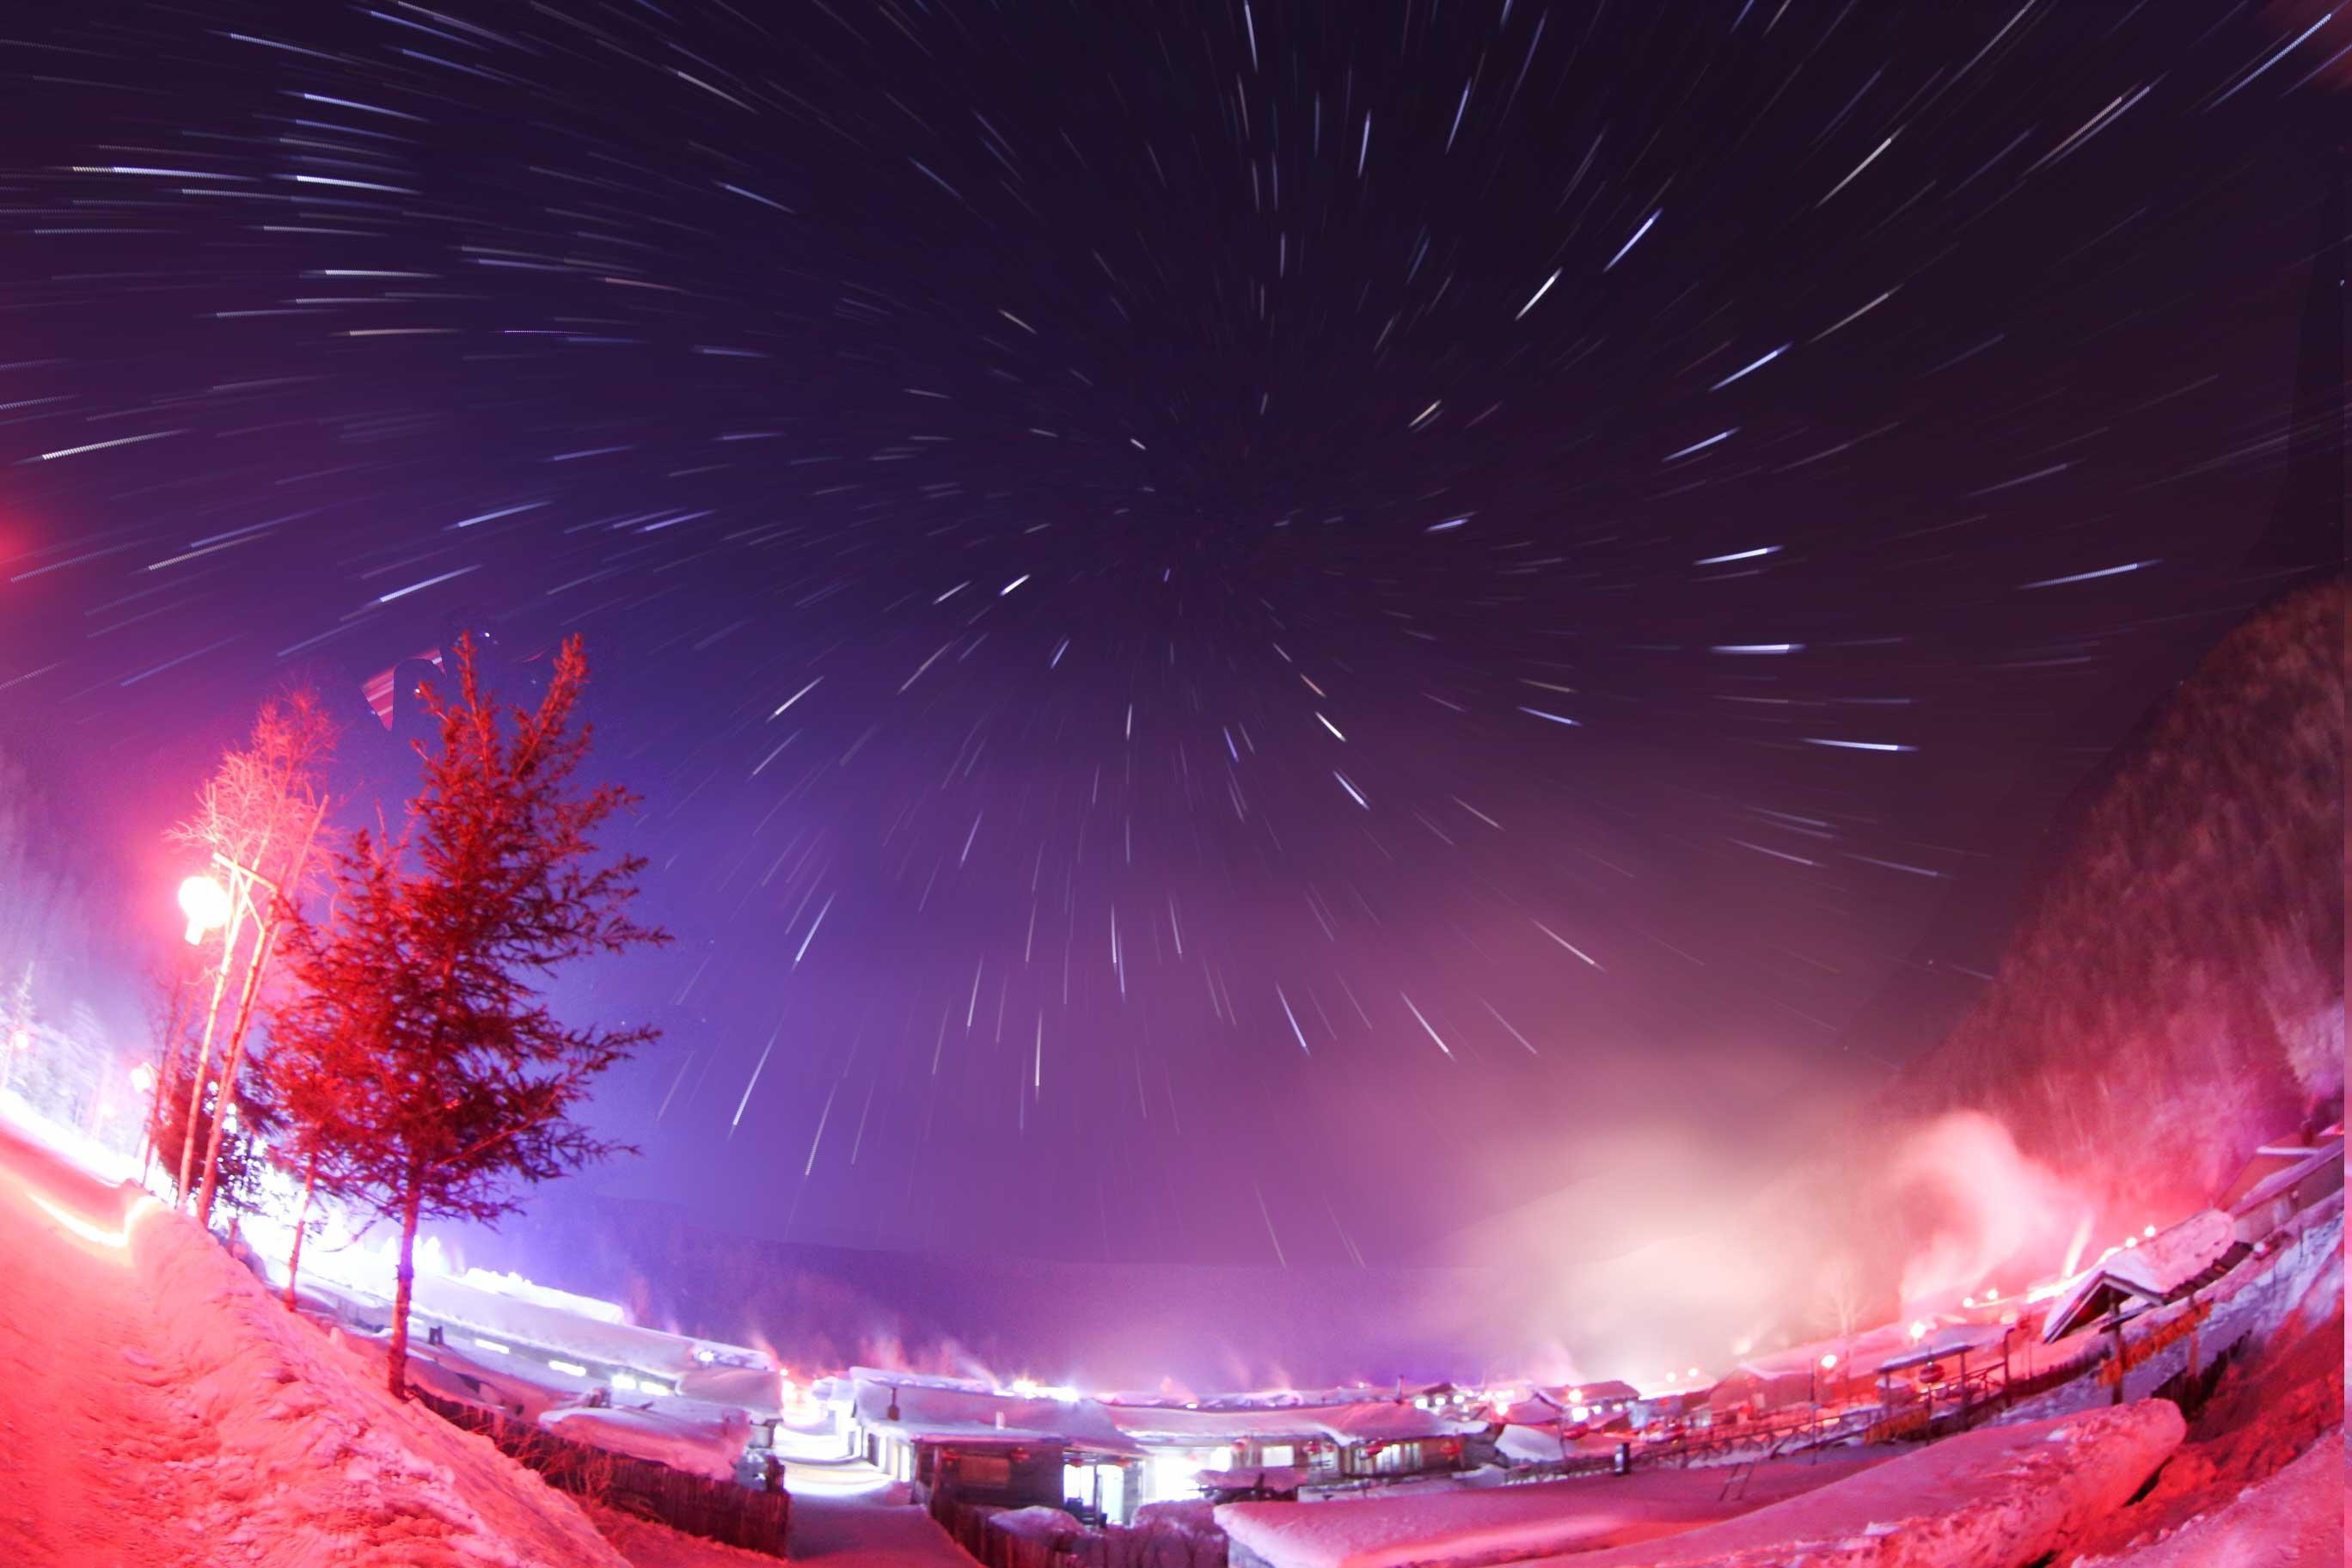 Gambar salju cahaya langit rekreasi ruang kegelapan tahun gambar salju cahaya langit rekreasi ruang kegelapan tahun baru dunia festival kembang api pesta peristiwa tengah malam pemandangan malam voltagebd Images